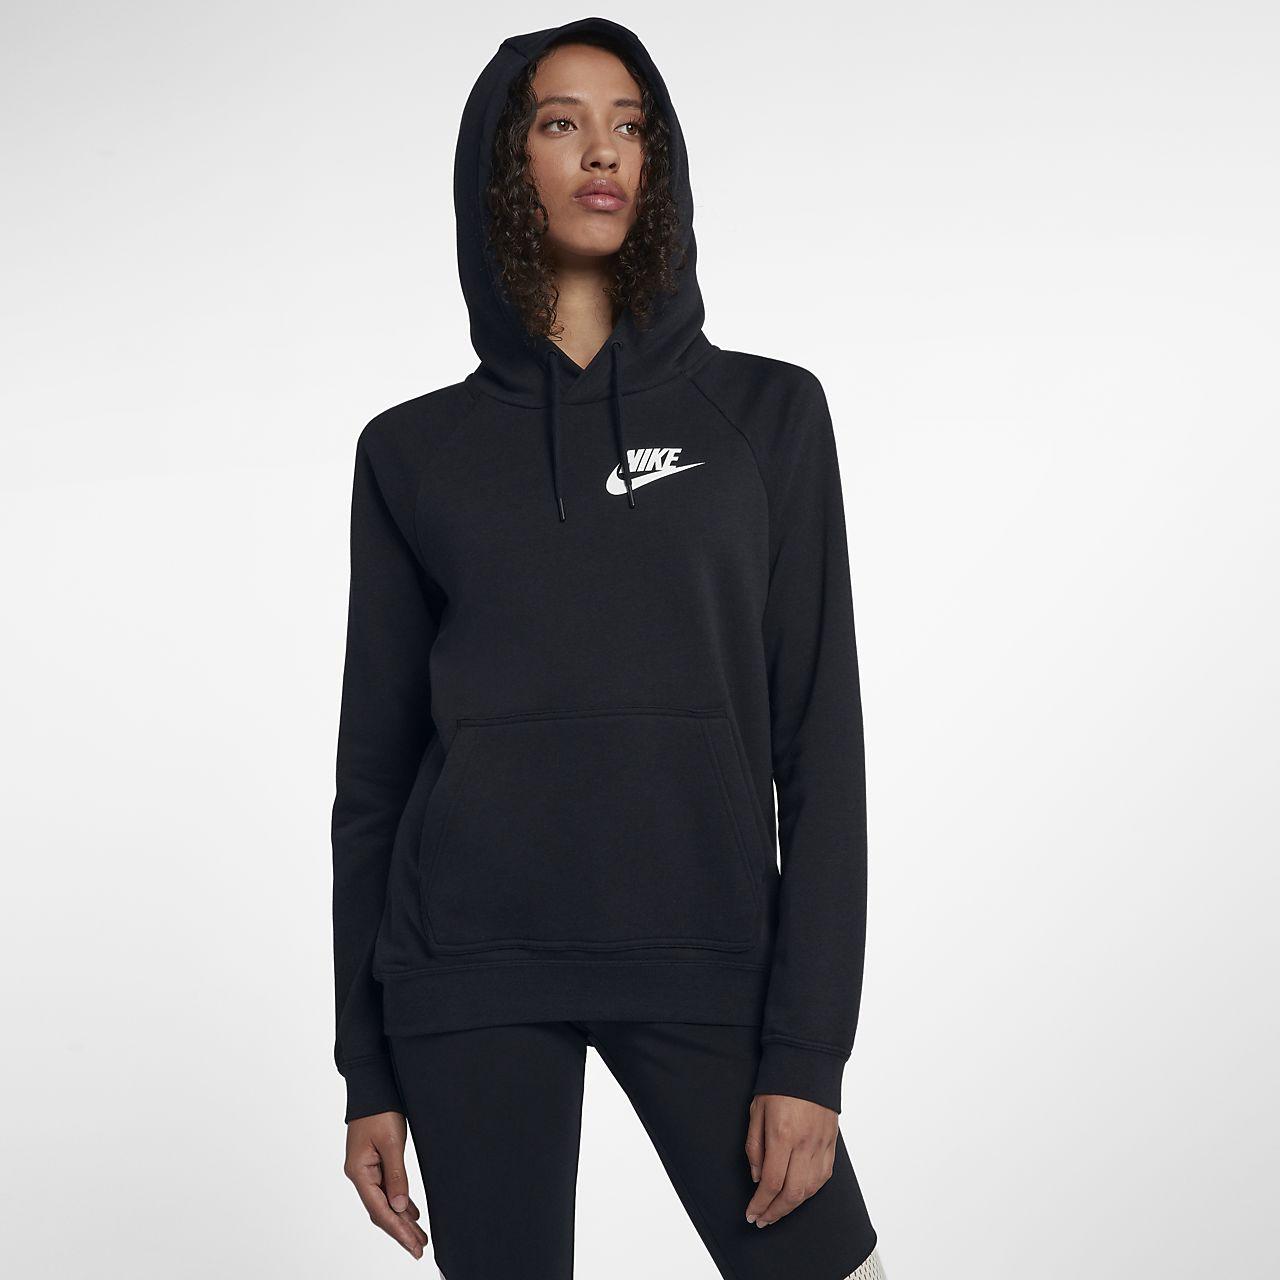 660113dca37 Nike Sportswear Rally Women s Hoodie. Nike.com